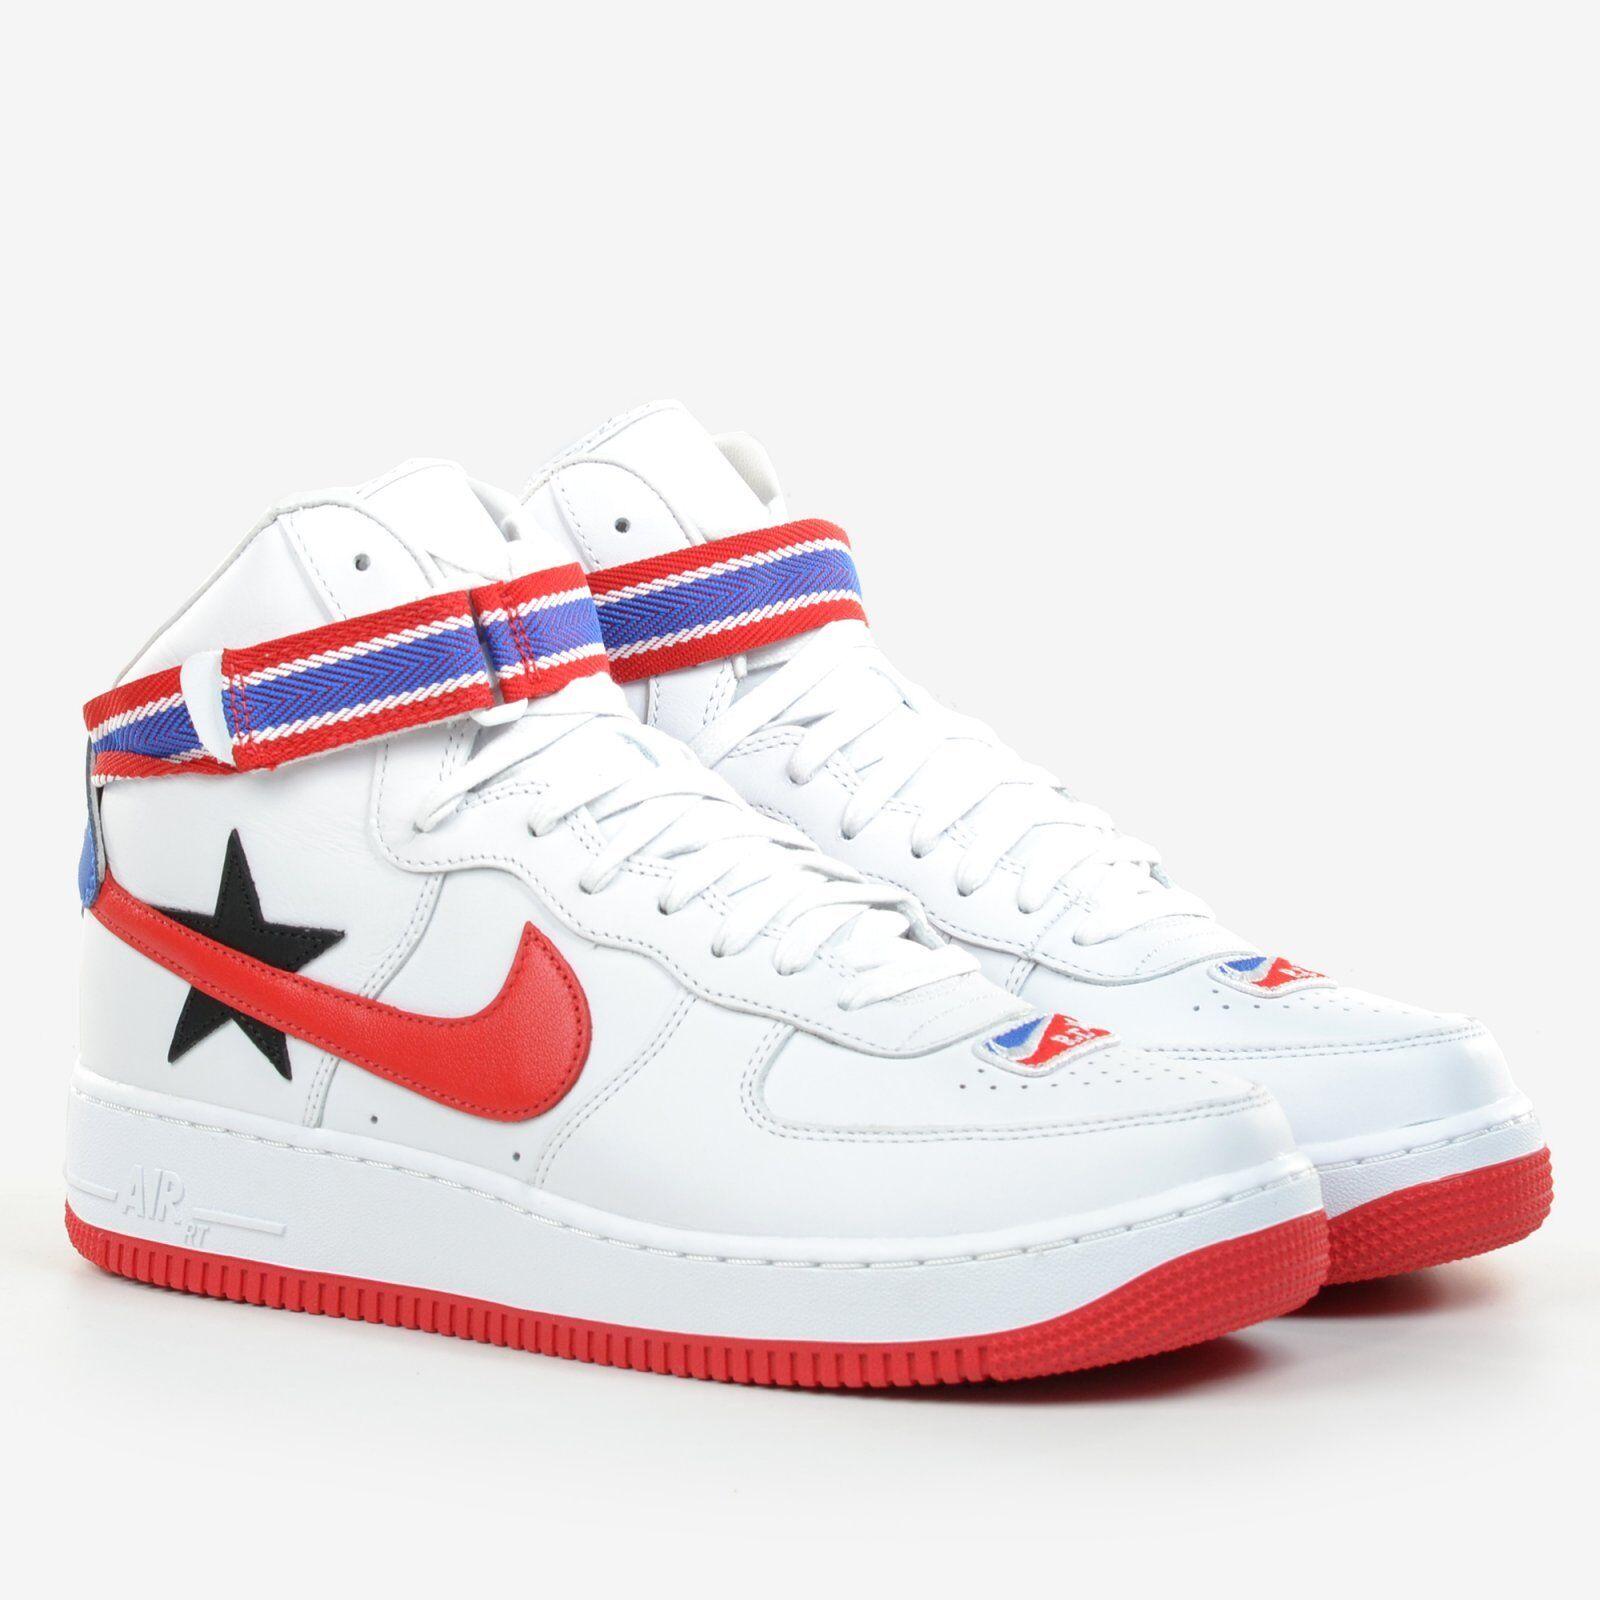 separation shoes 94a65 da888 NikeLab X RT Air Force 1 High Riccardo Tisci US 10.5 White Red Black Aq3366- 100 for sale online   eBay